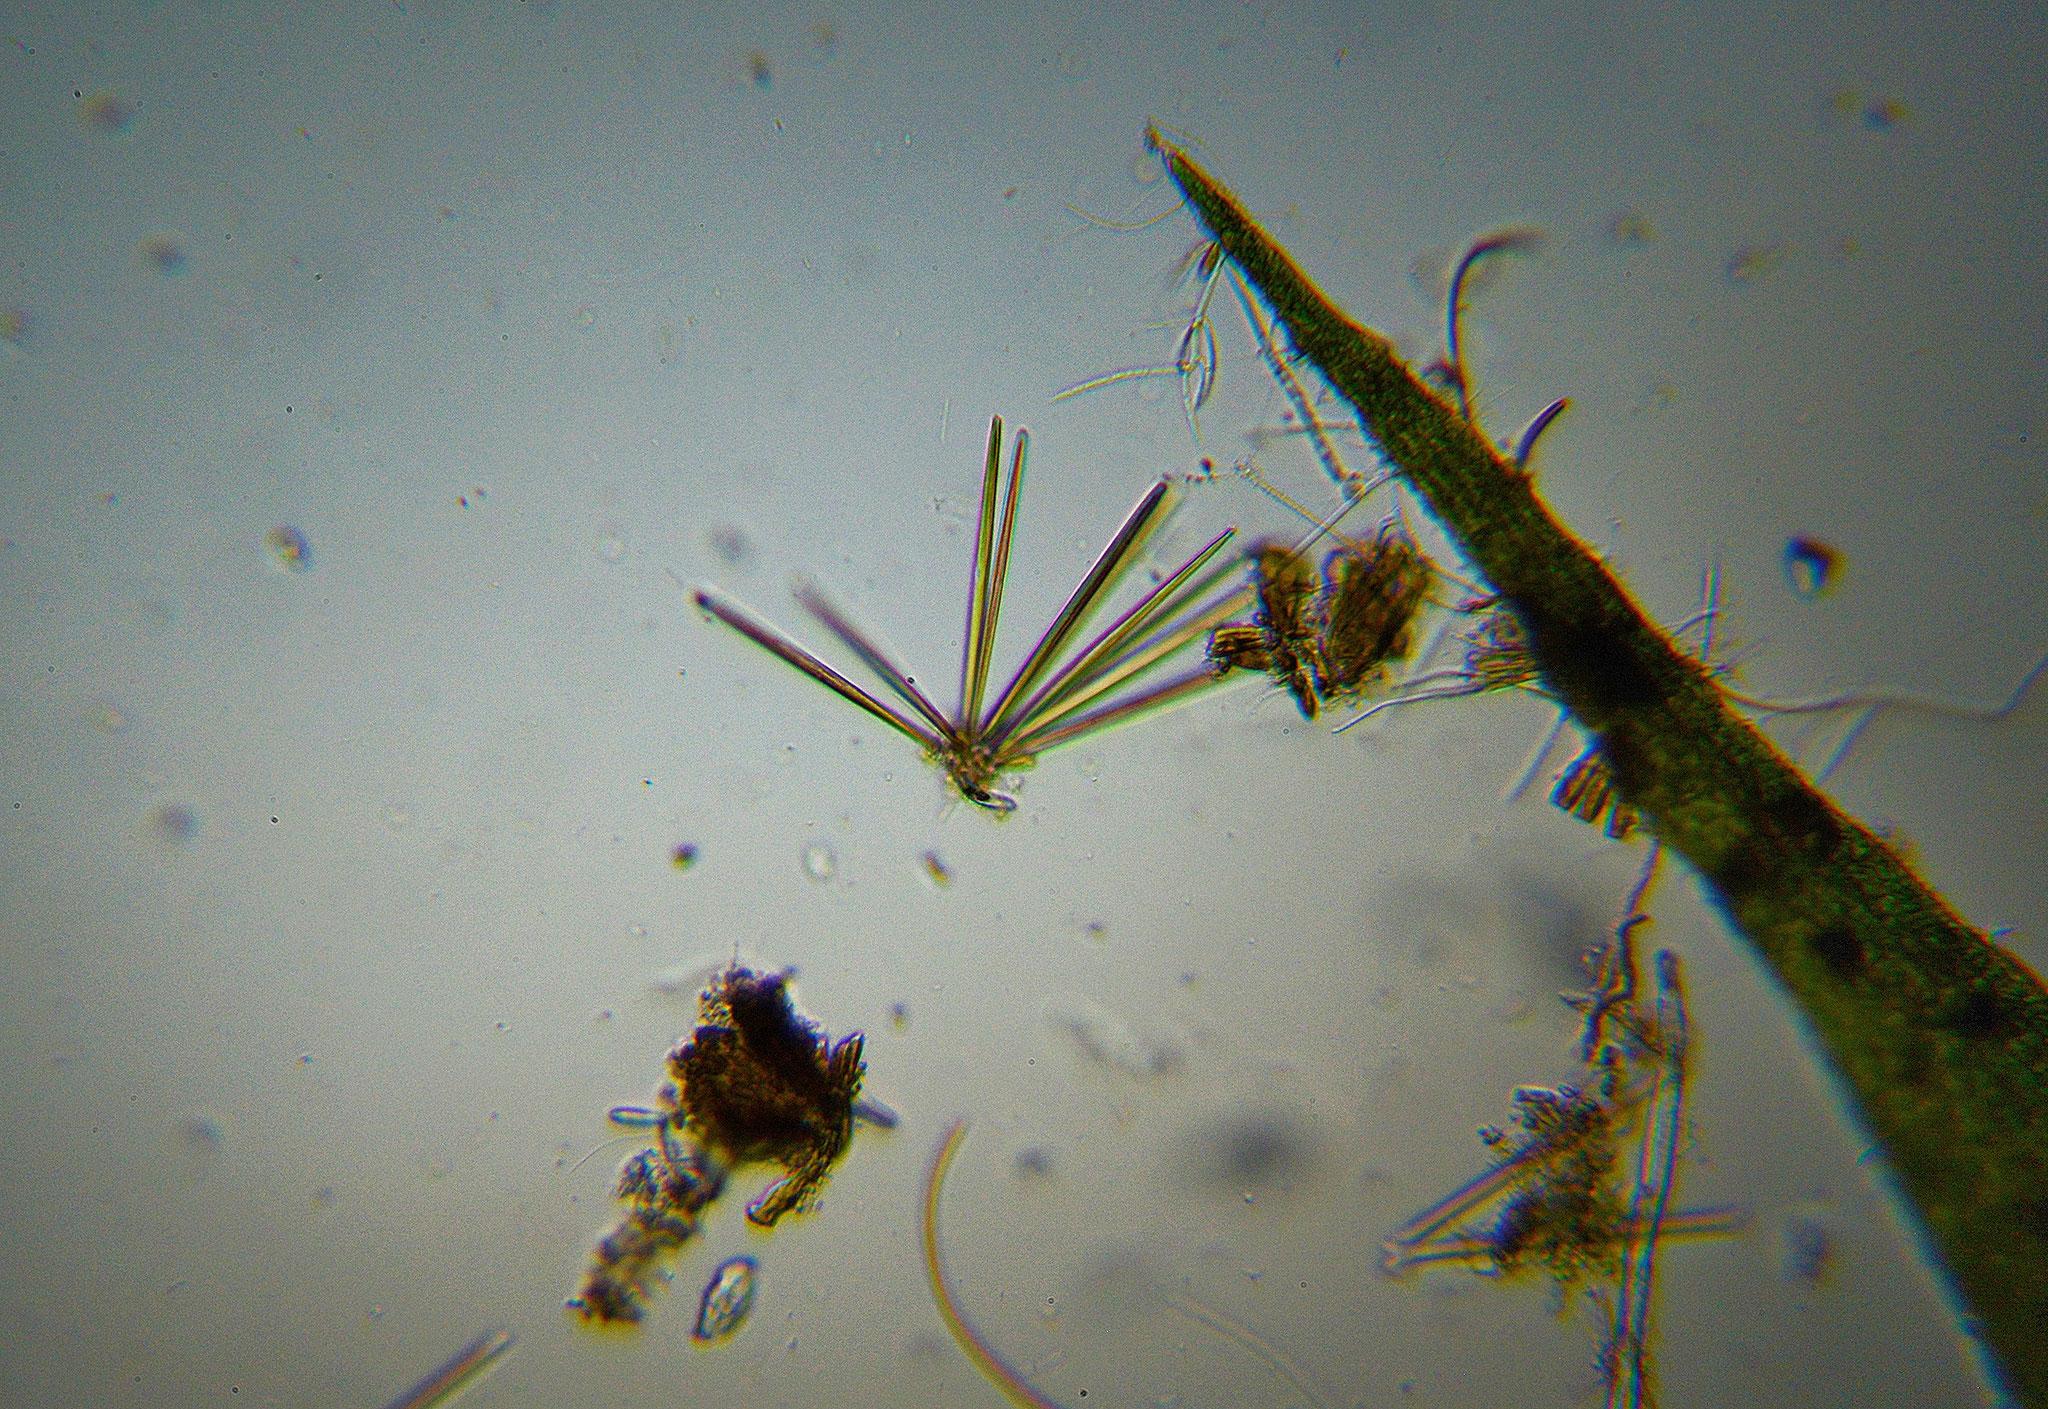 Strahlenförmige Kolonie, vermutlich Stab-Kieselalgen